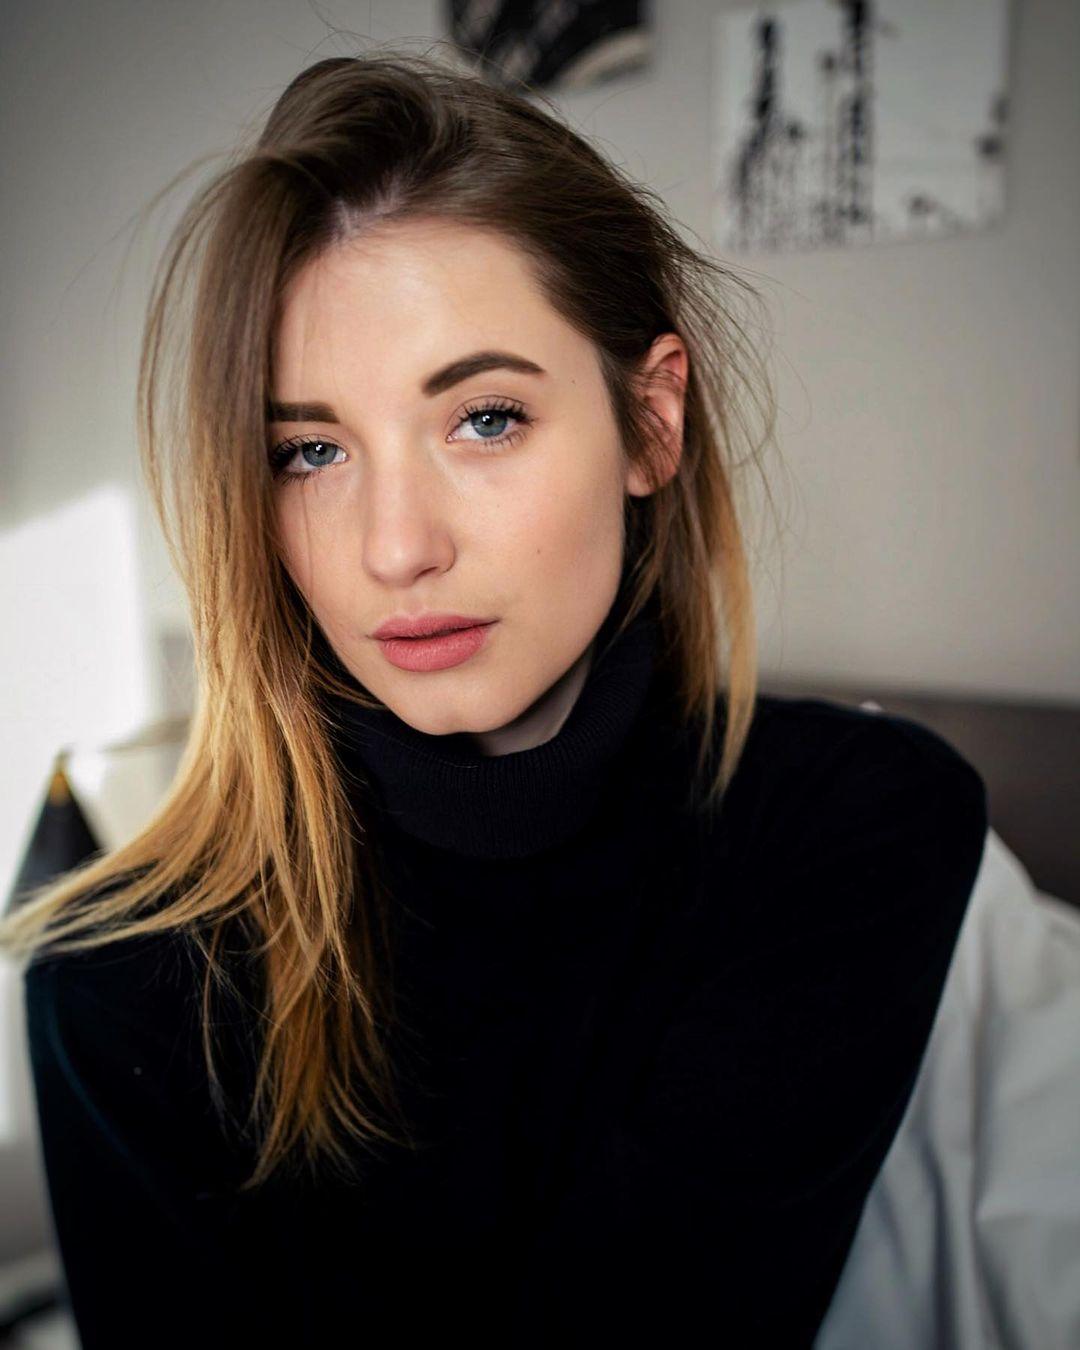 Julia-Nikola-Gauly-Wallpapers-Insta-Fit-Bio-7